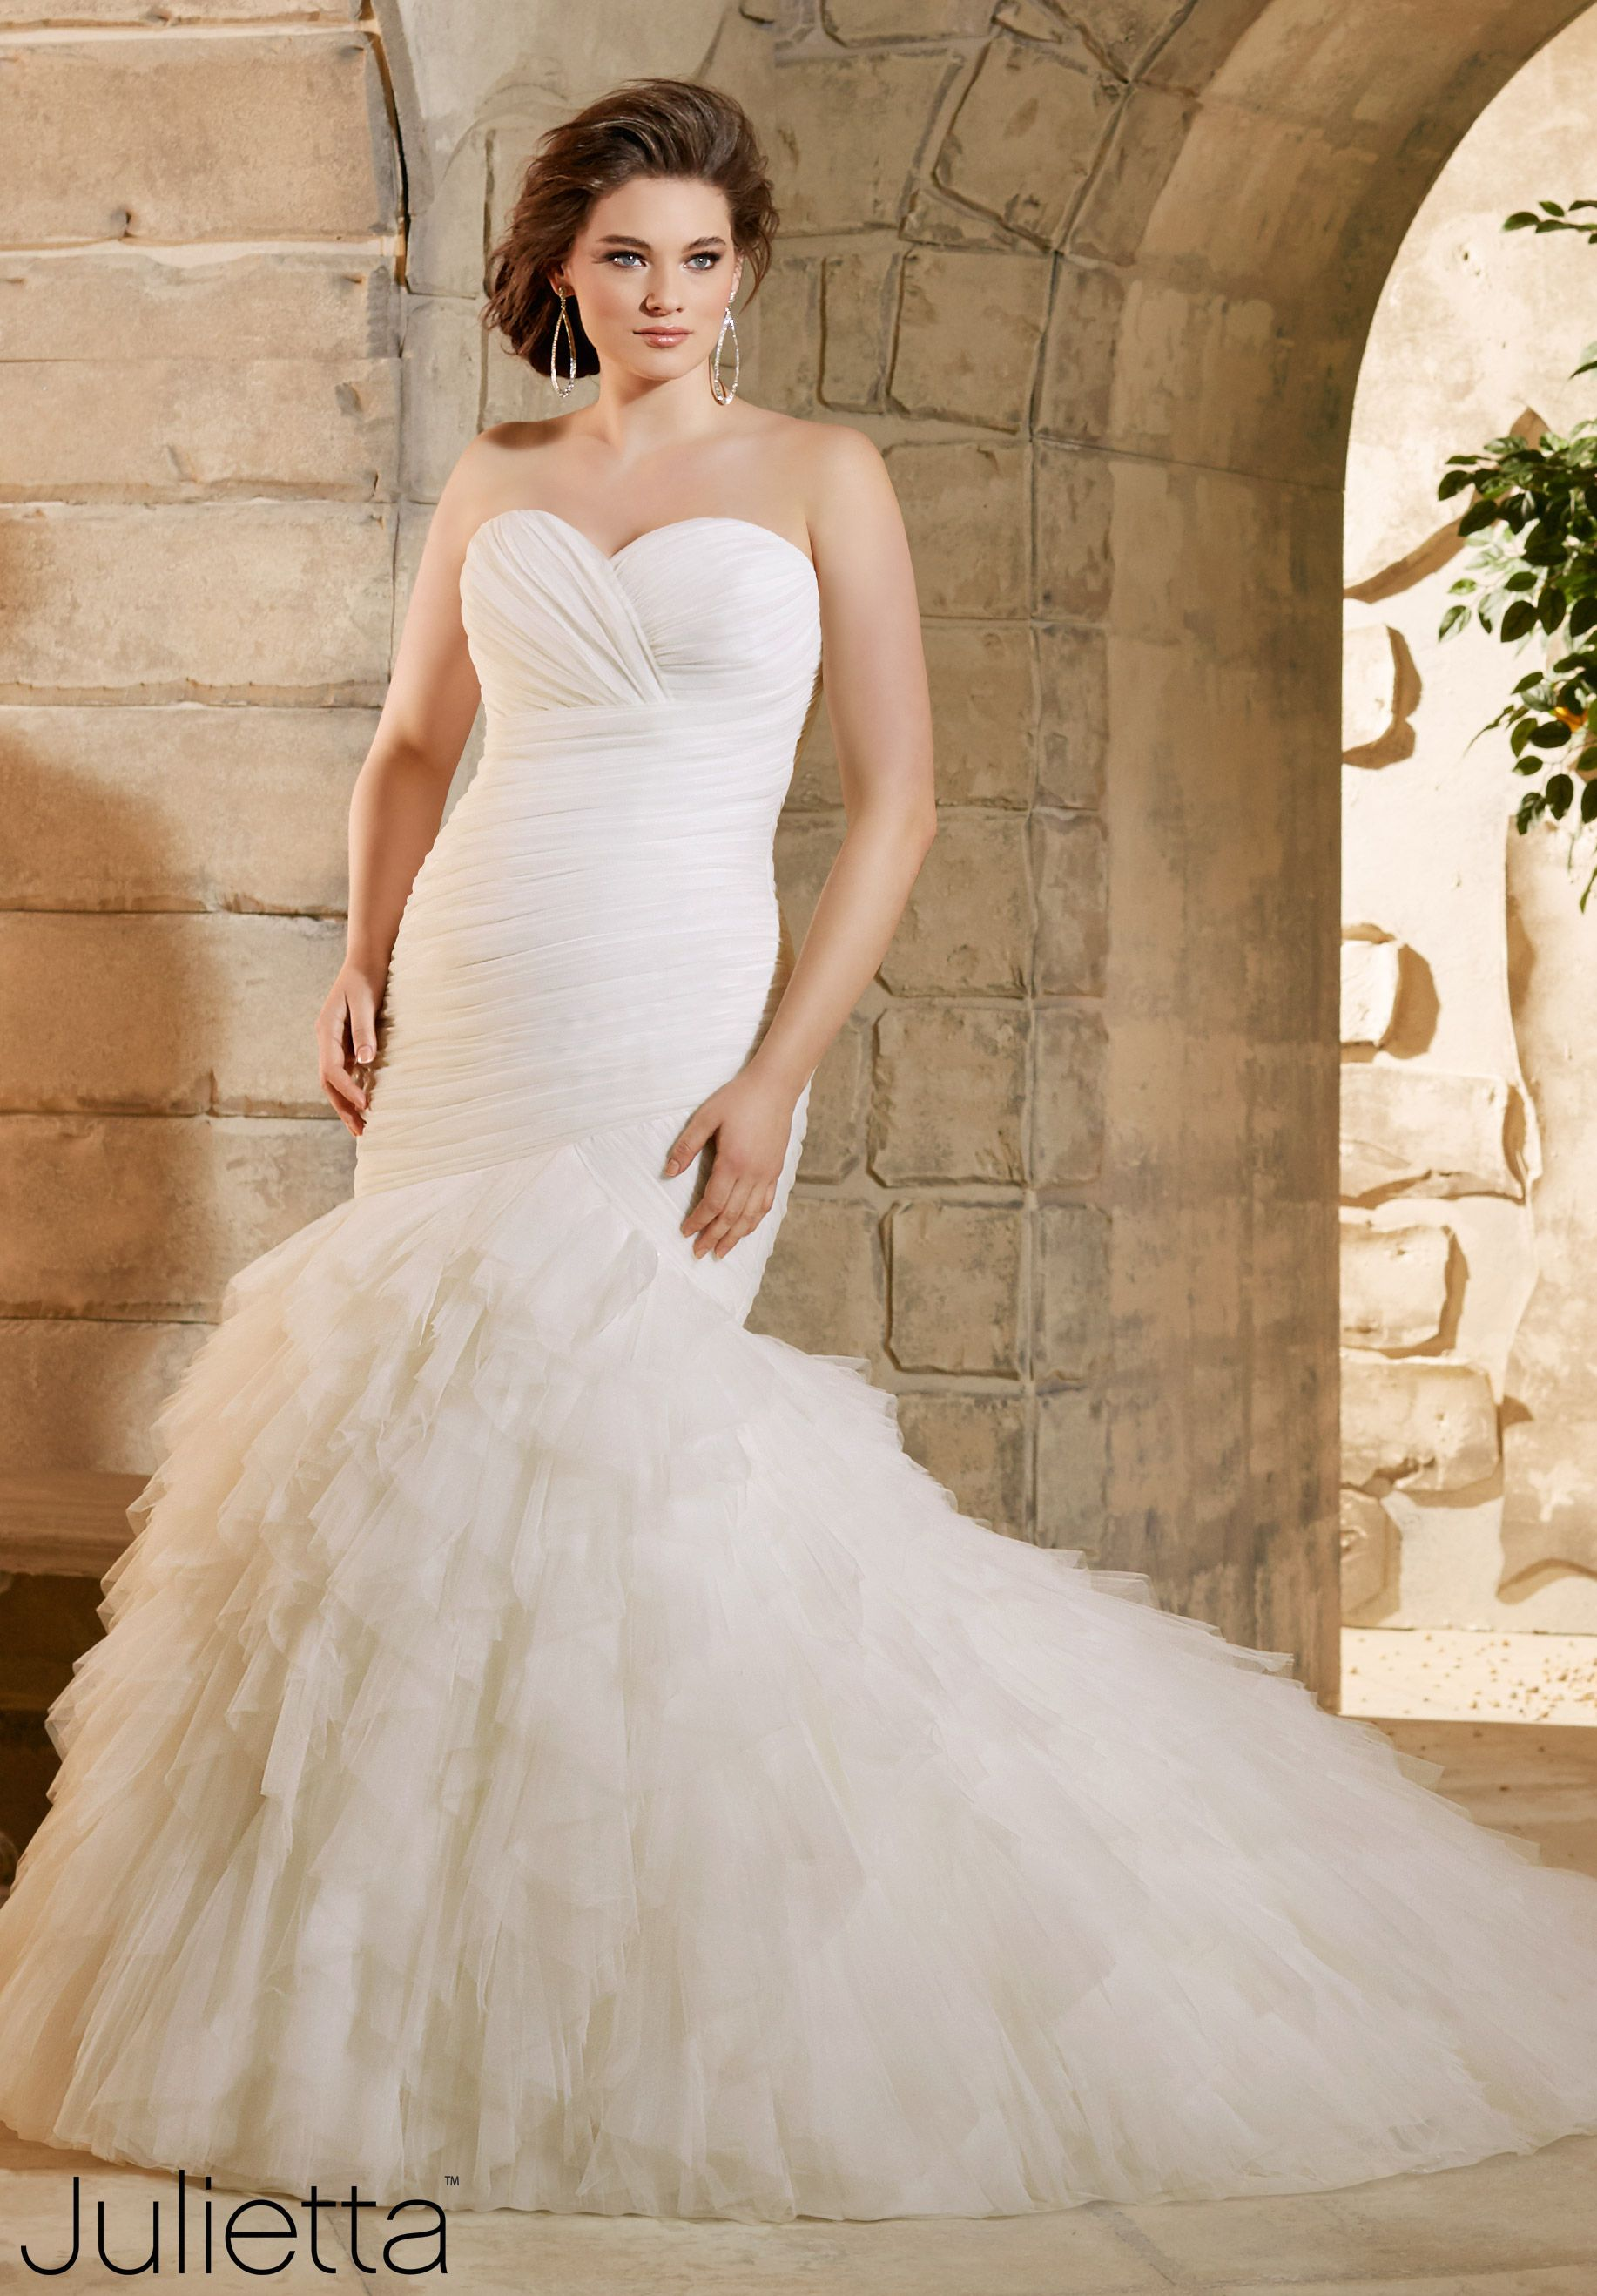 Unique  best A Dash of Bleu us Favorite Wedding Dresses images on Pinterest Wedding dressses Wedding dress styles and Bridal gowns